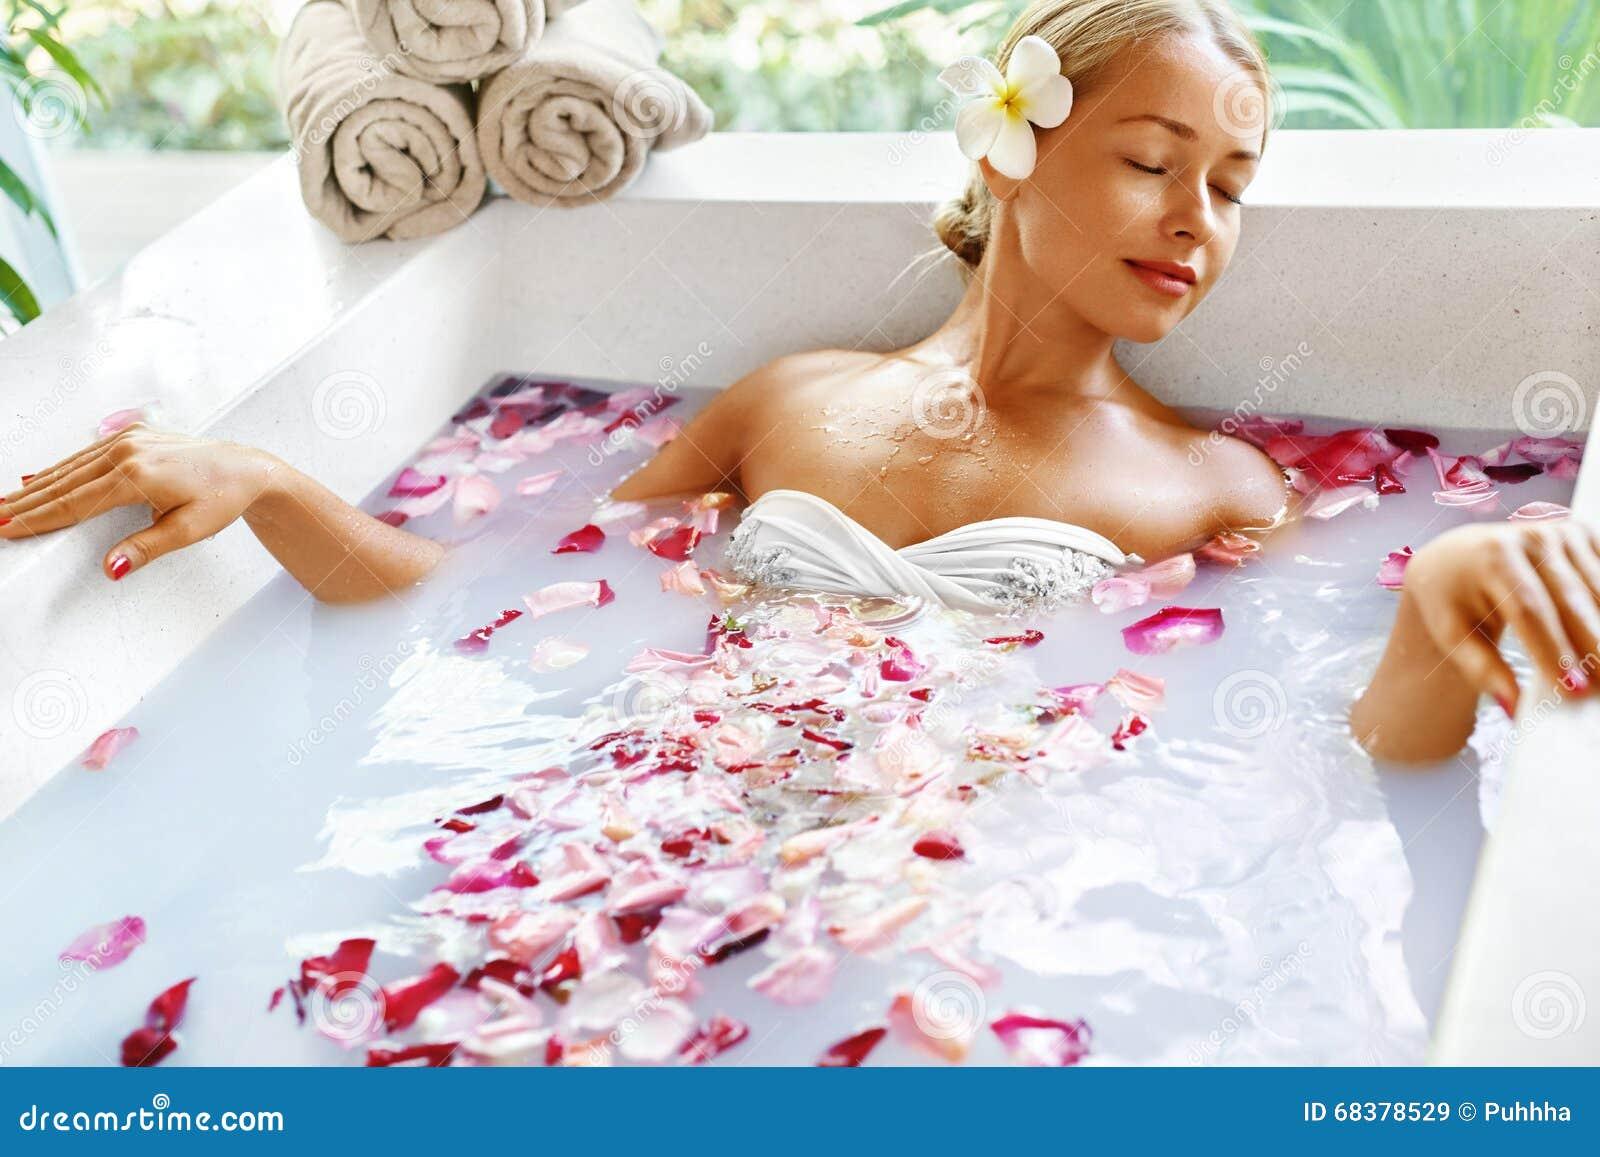 Health, Beauty. Woman Spa Body Care. Relaxing Flower Rose Bath